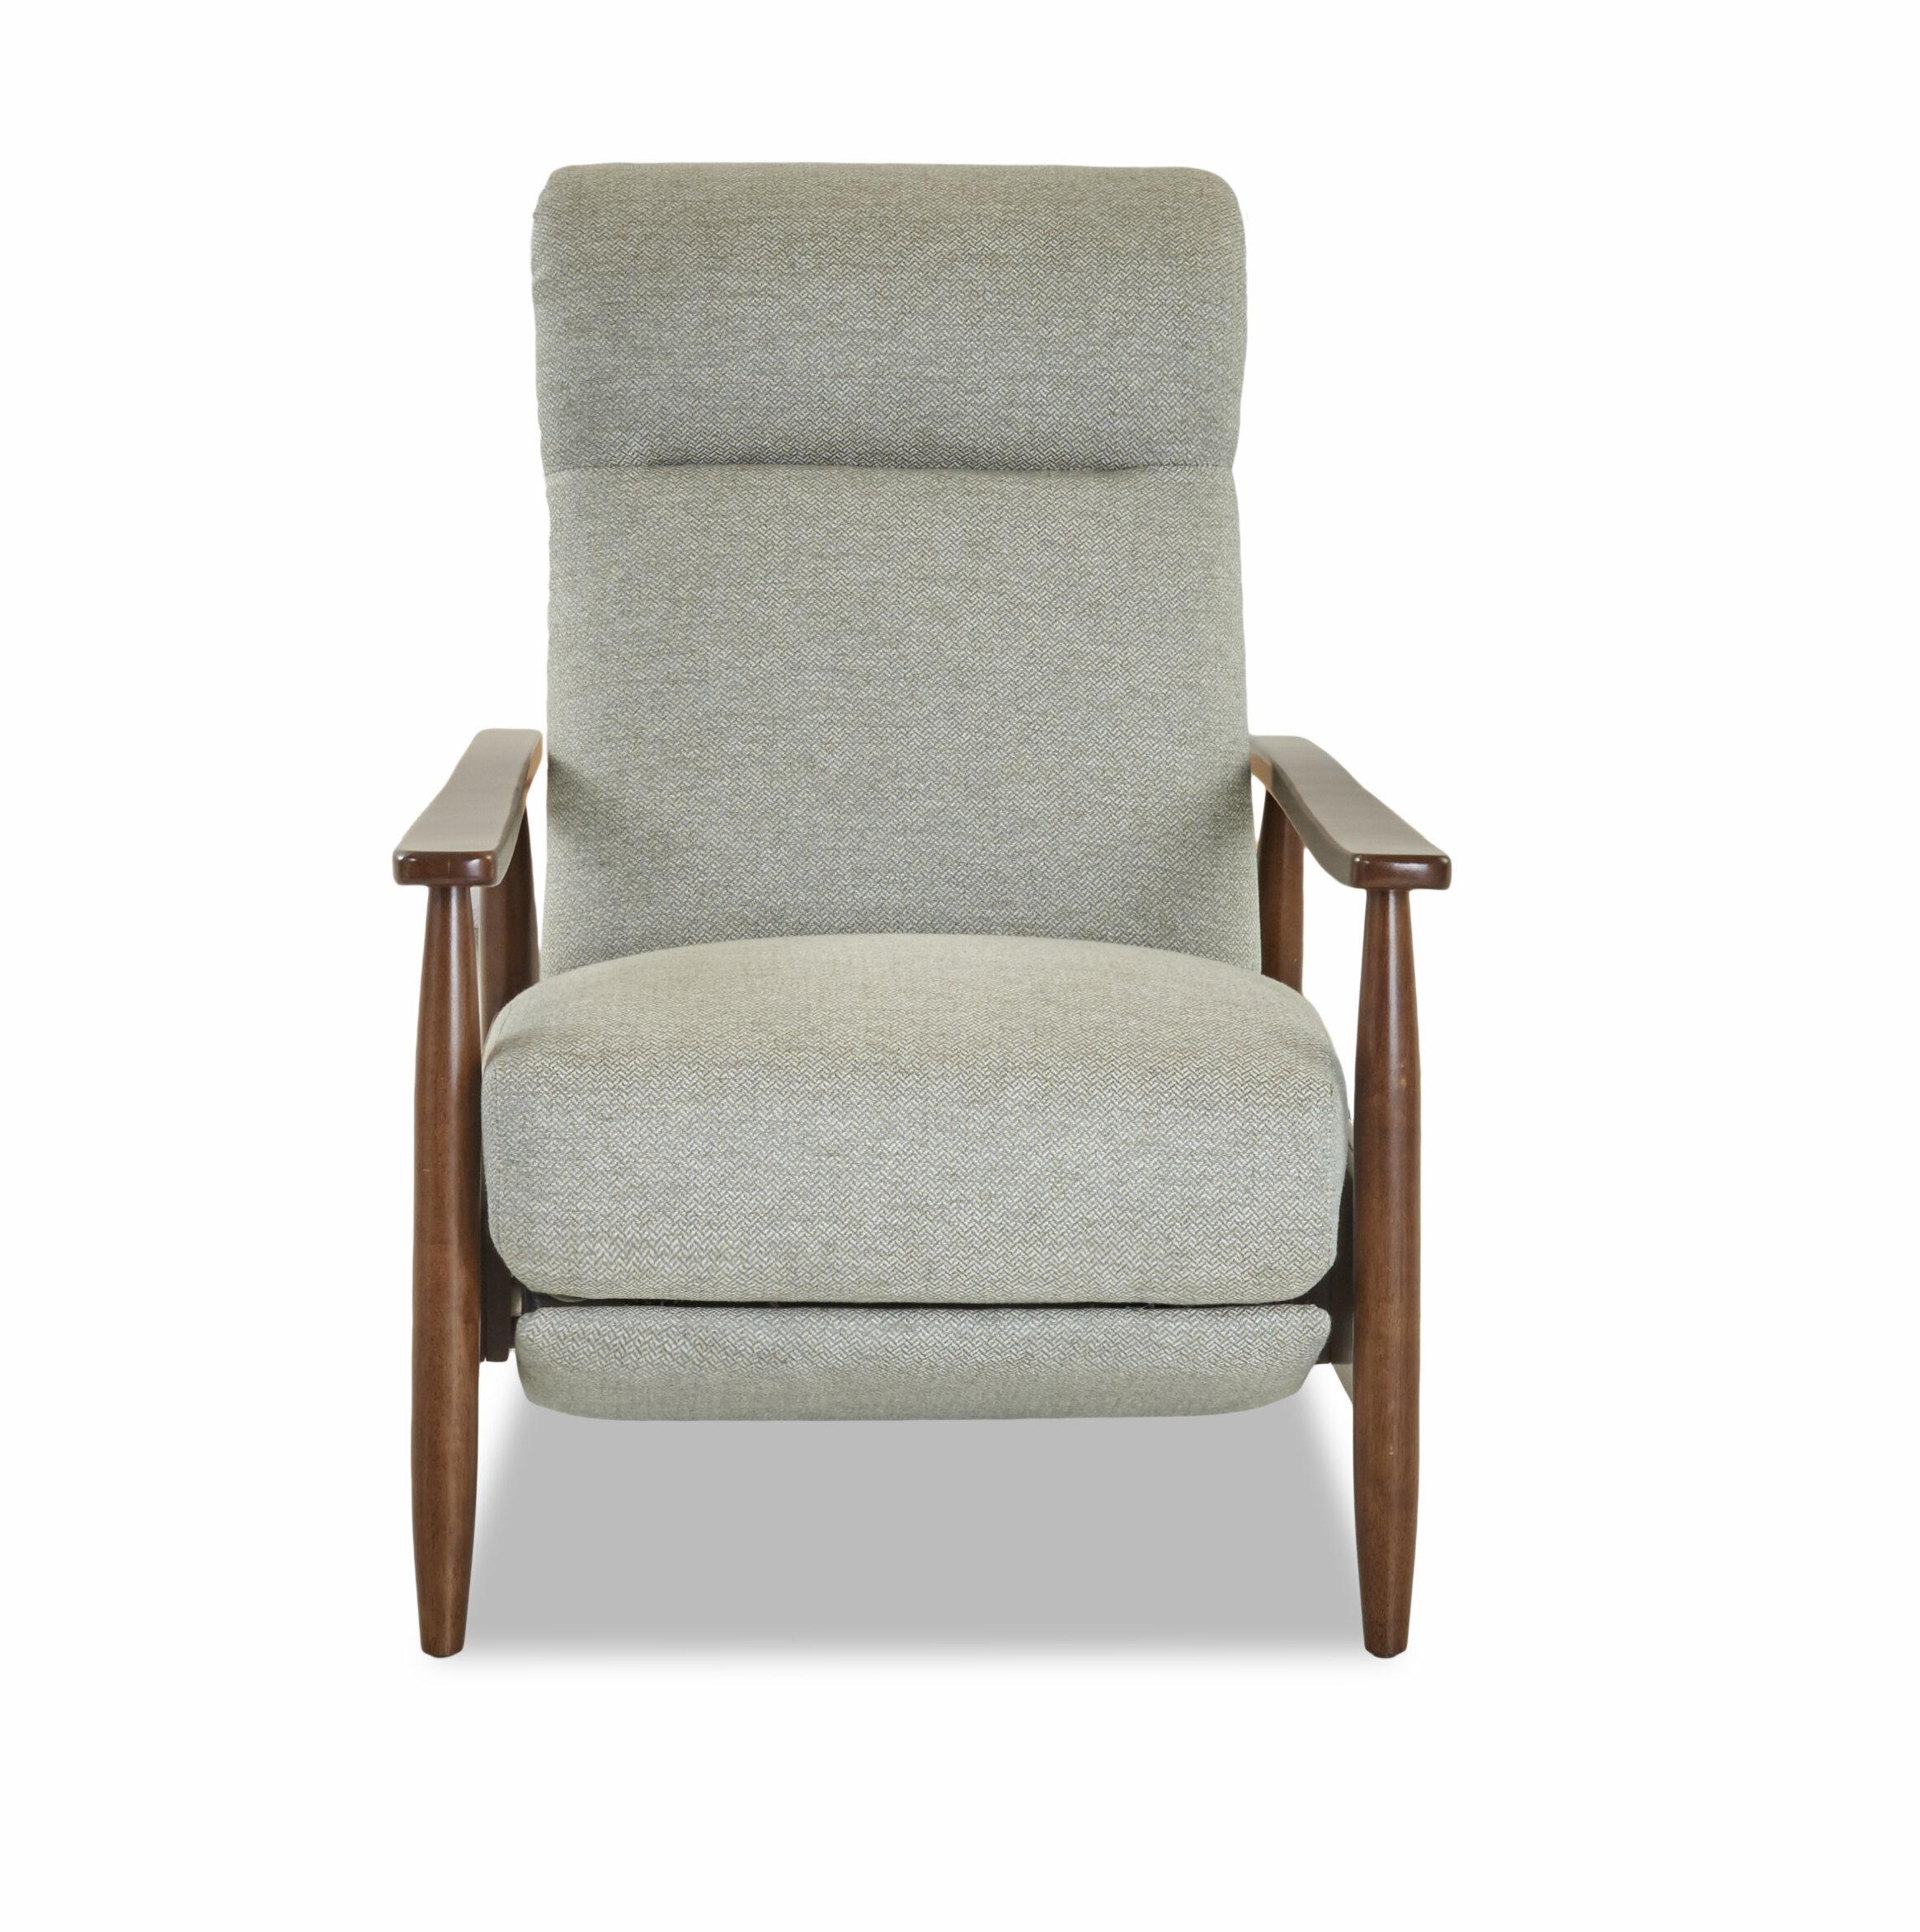 Noemi High Leg Reclining Chair